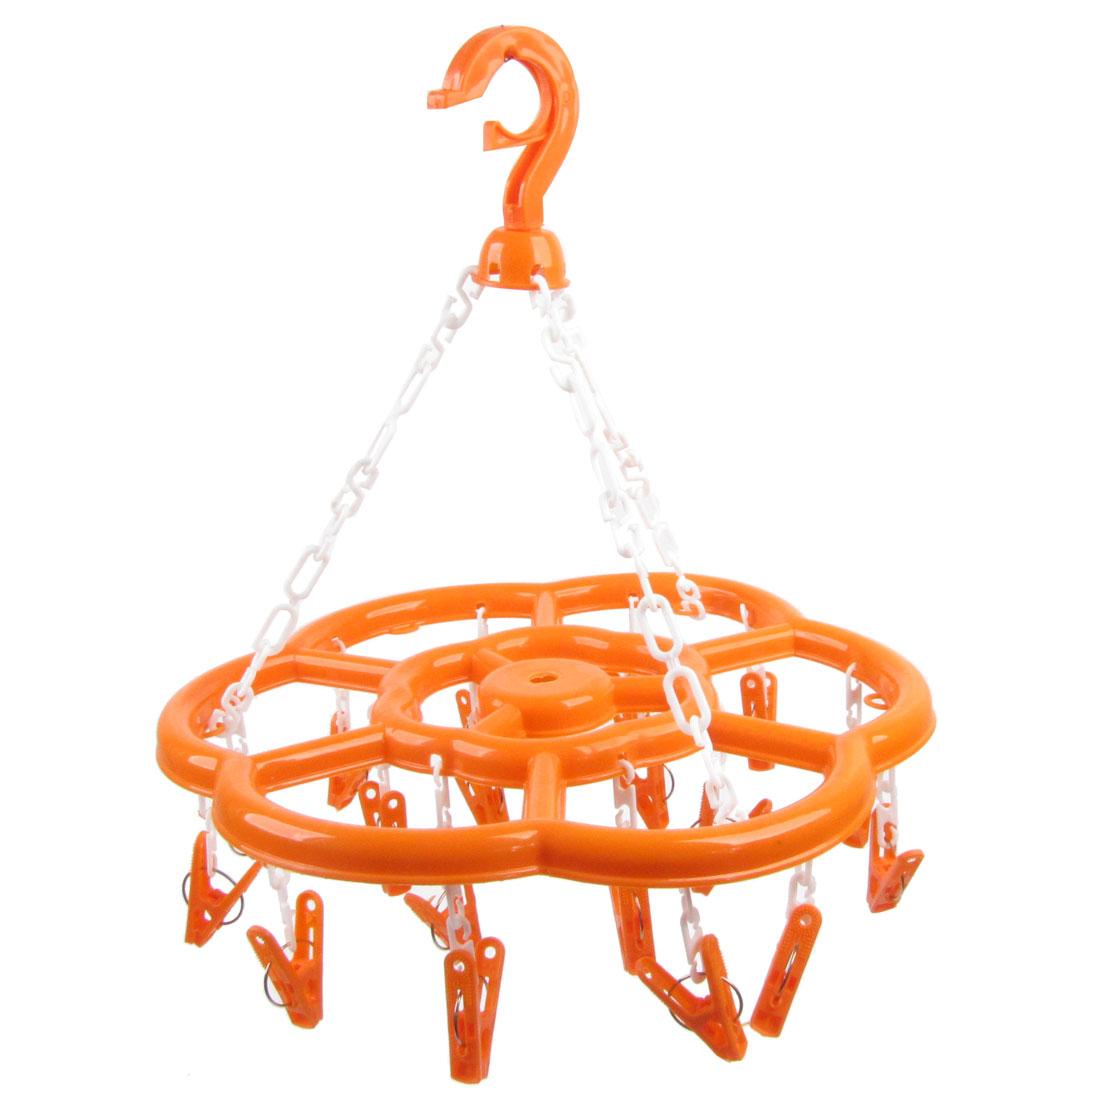 "13.6"" Dia Orange Plastic 18 Cramp Pins Clips Plum Blossom Shaped Hanger Hook"